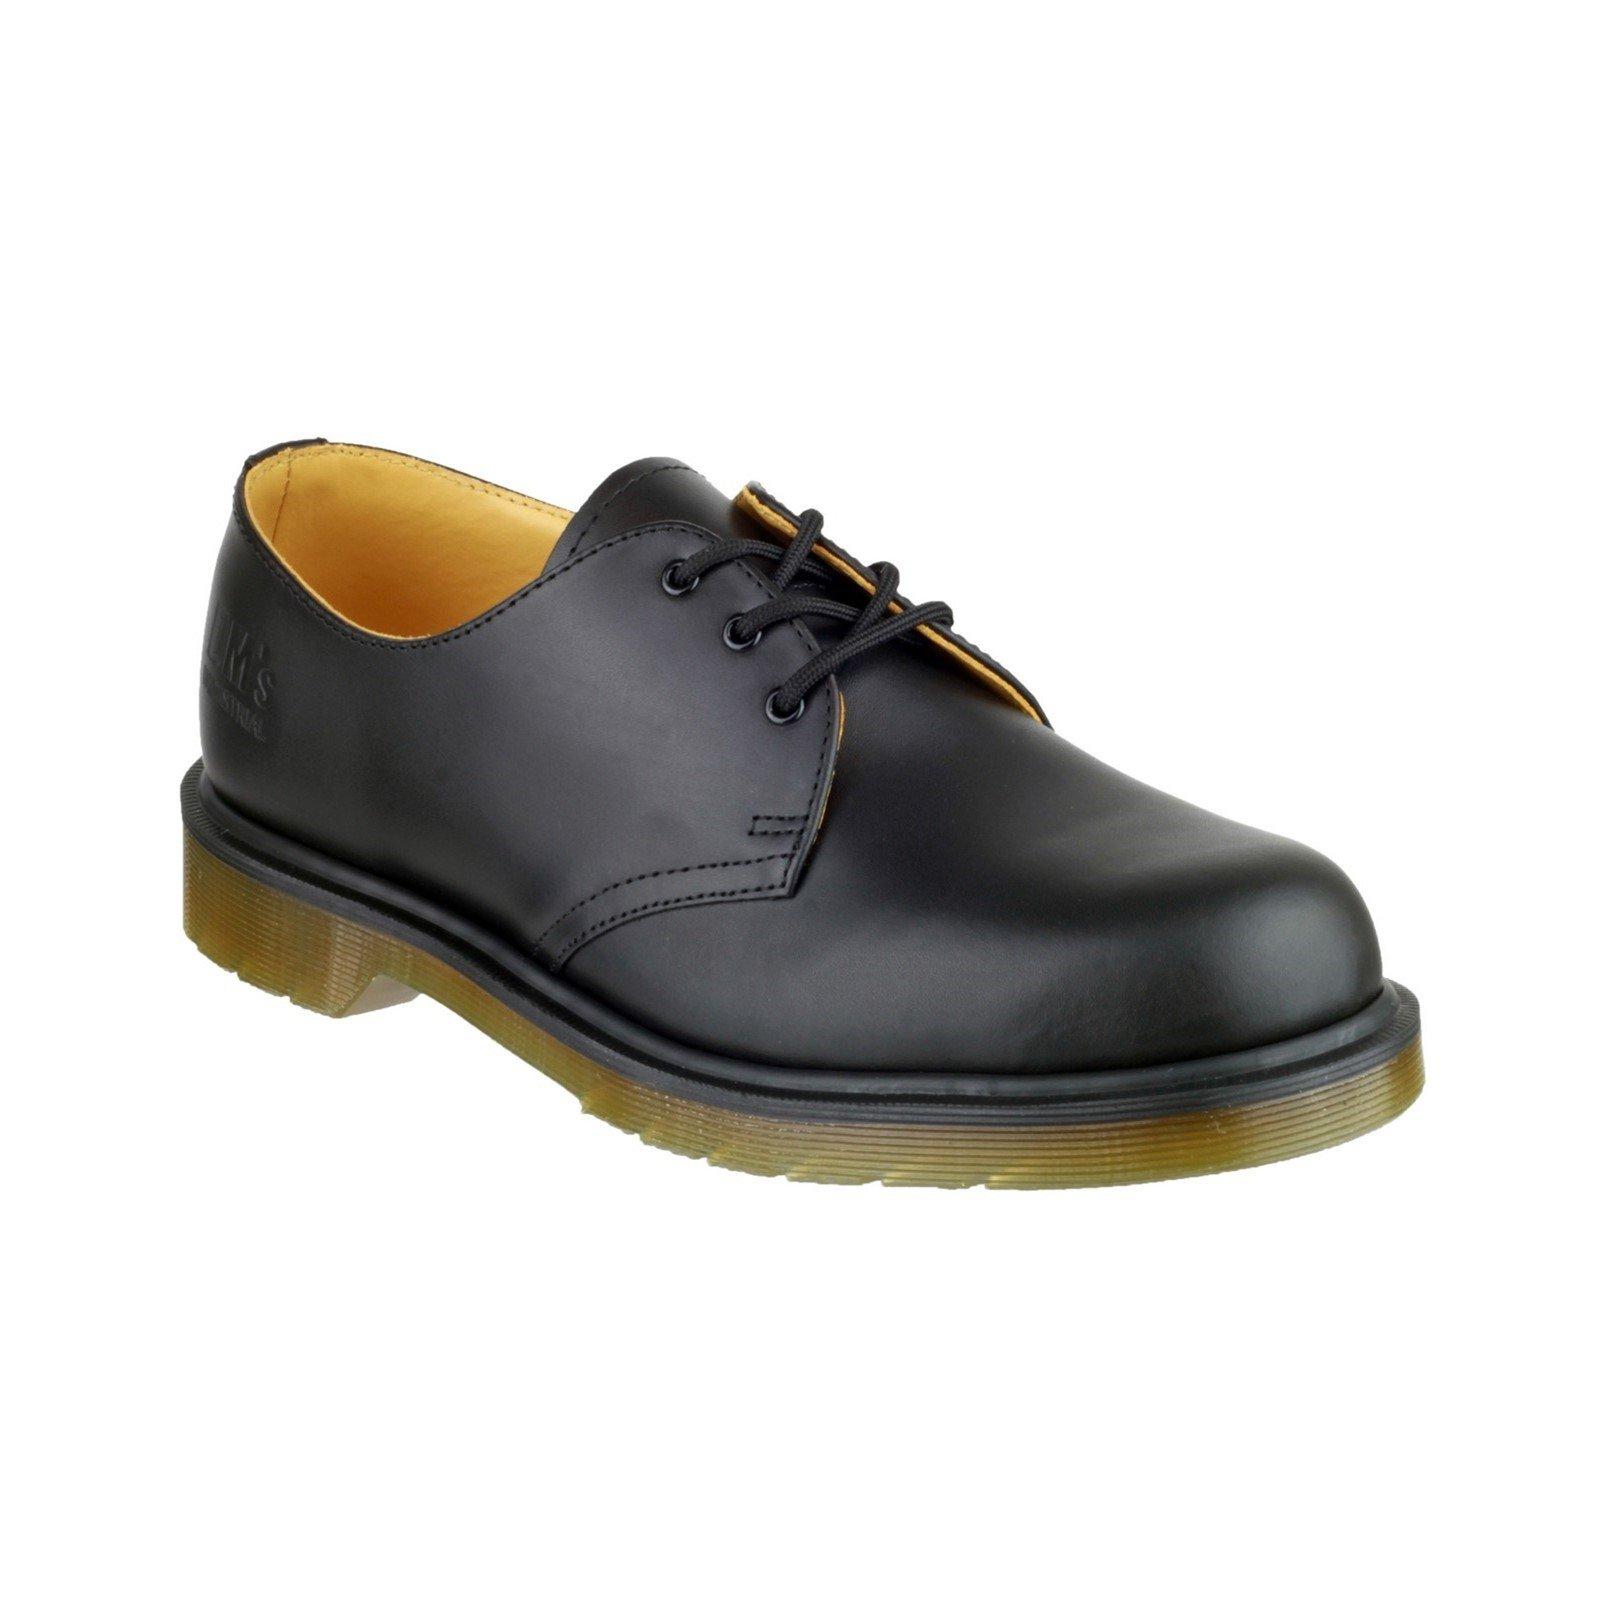 Dr Martens Men's Lace-Up Leather Derby Shoe Black 04915 - Black 14